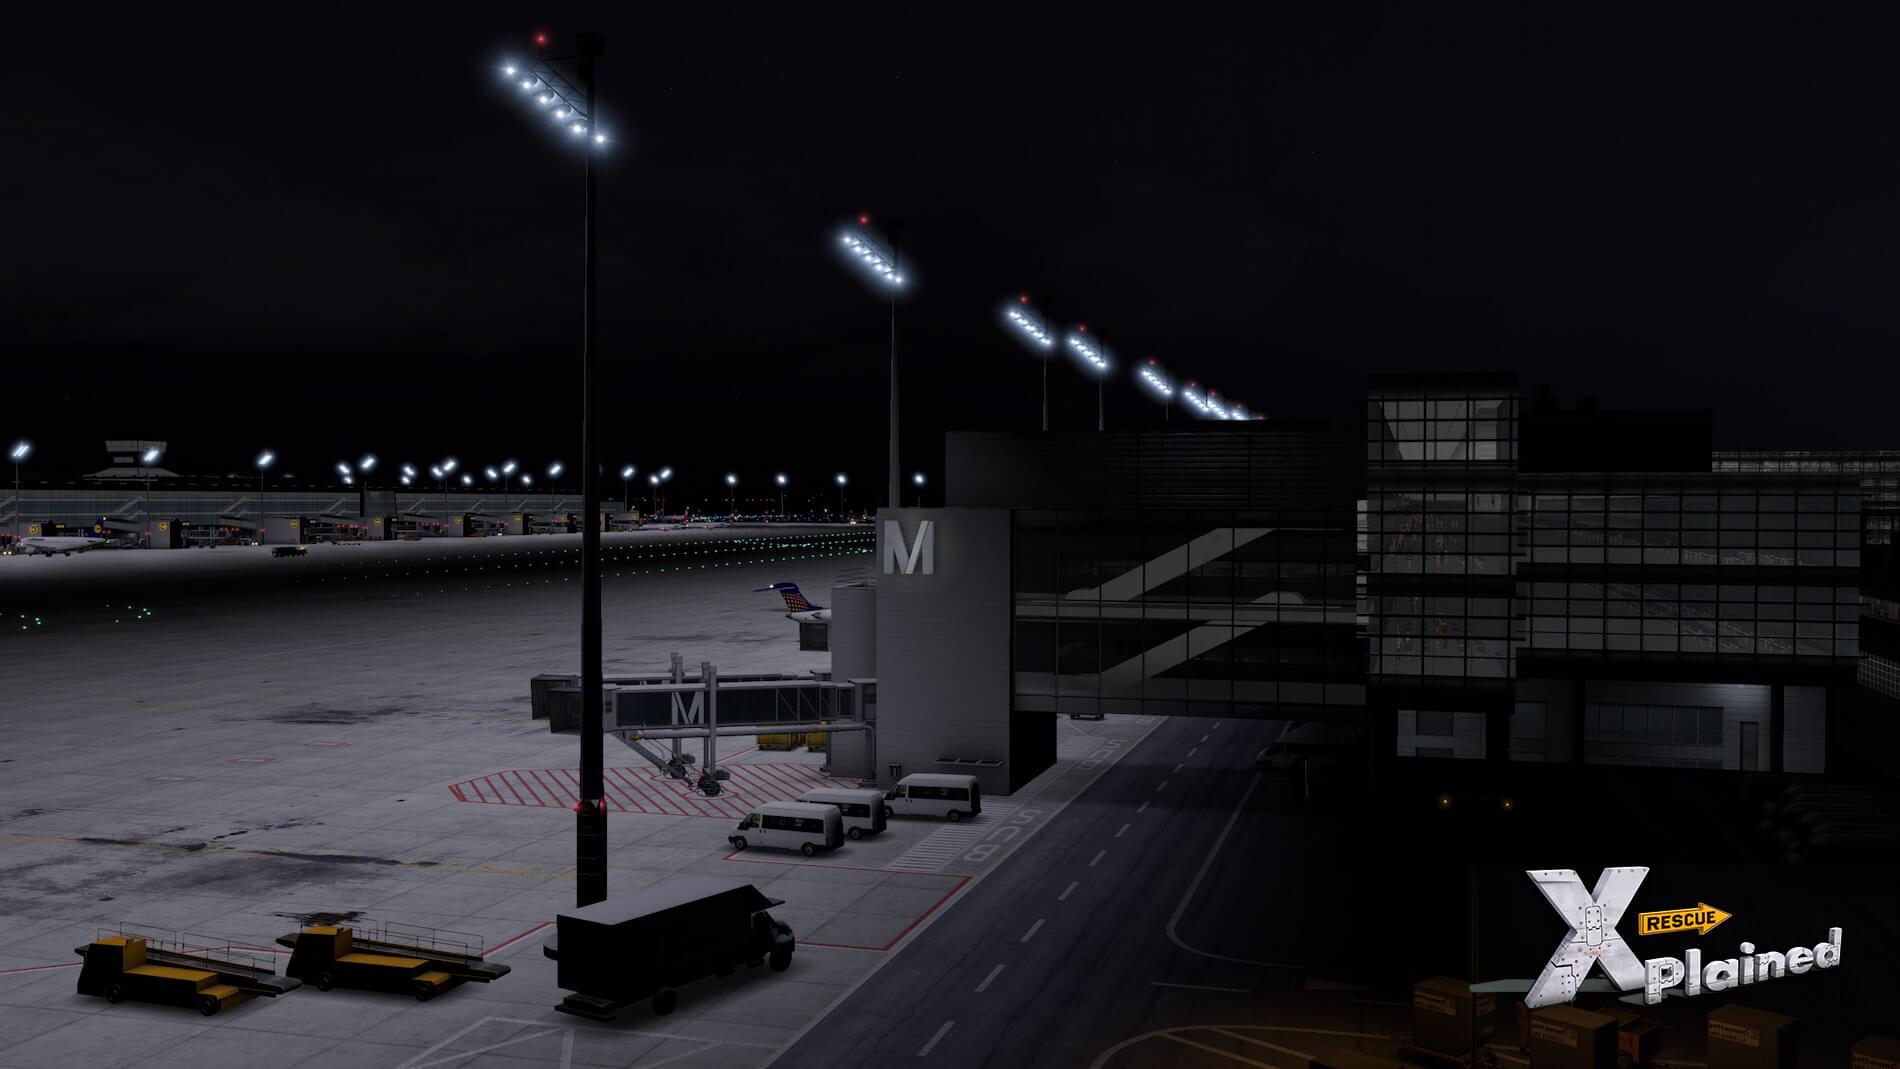 Evening-Impression-SFD-EDDM-11